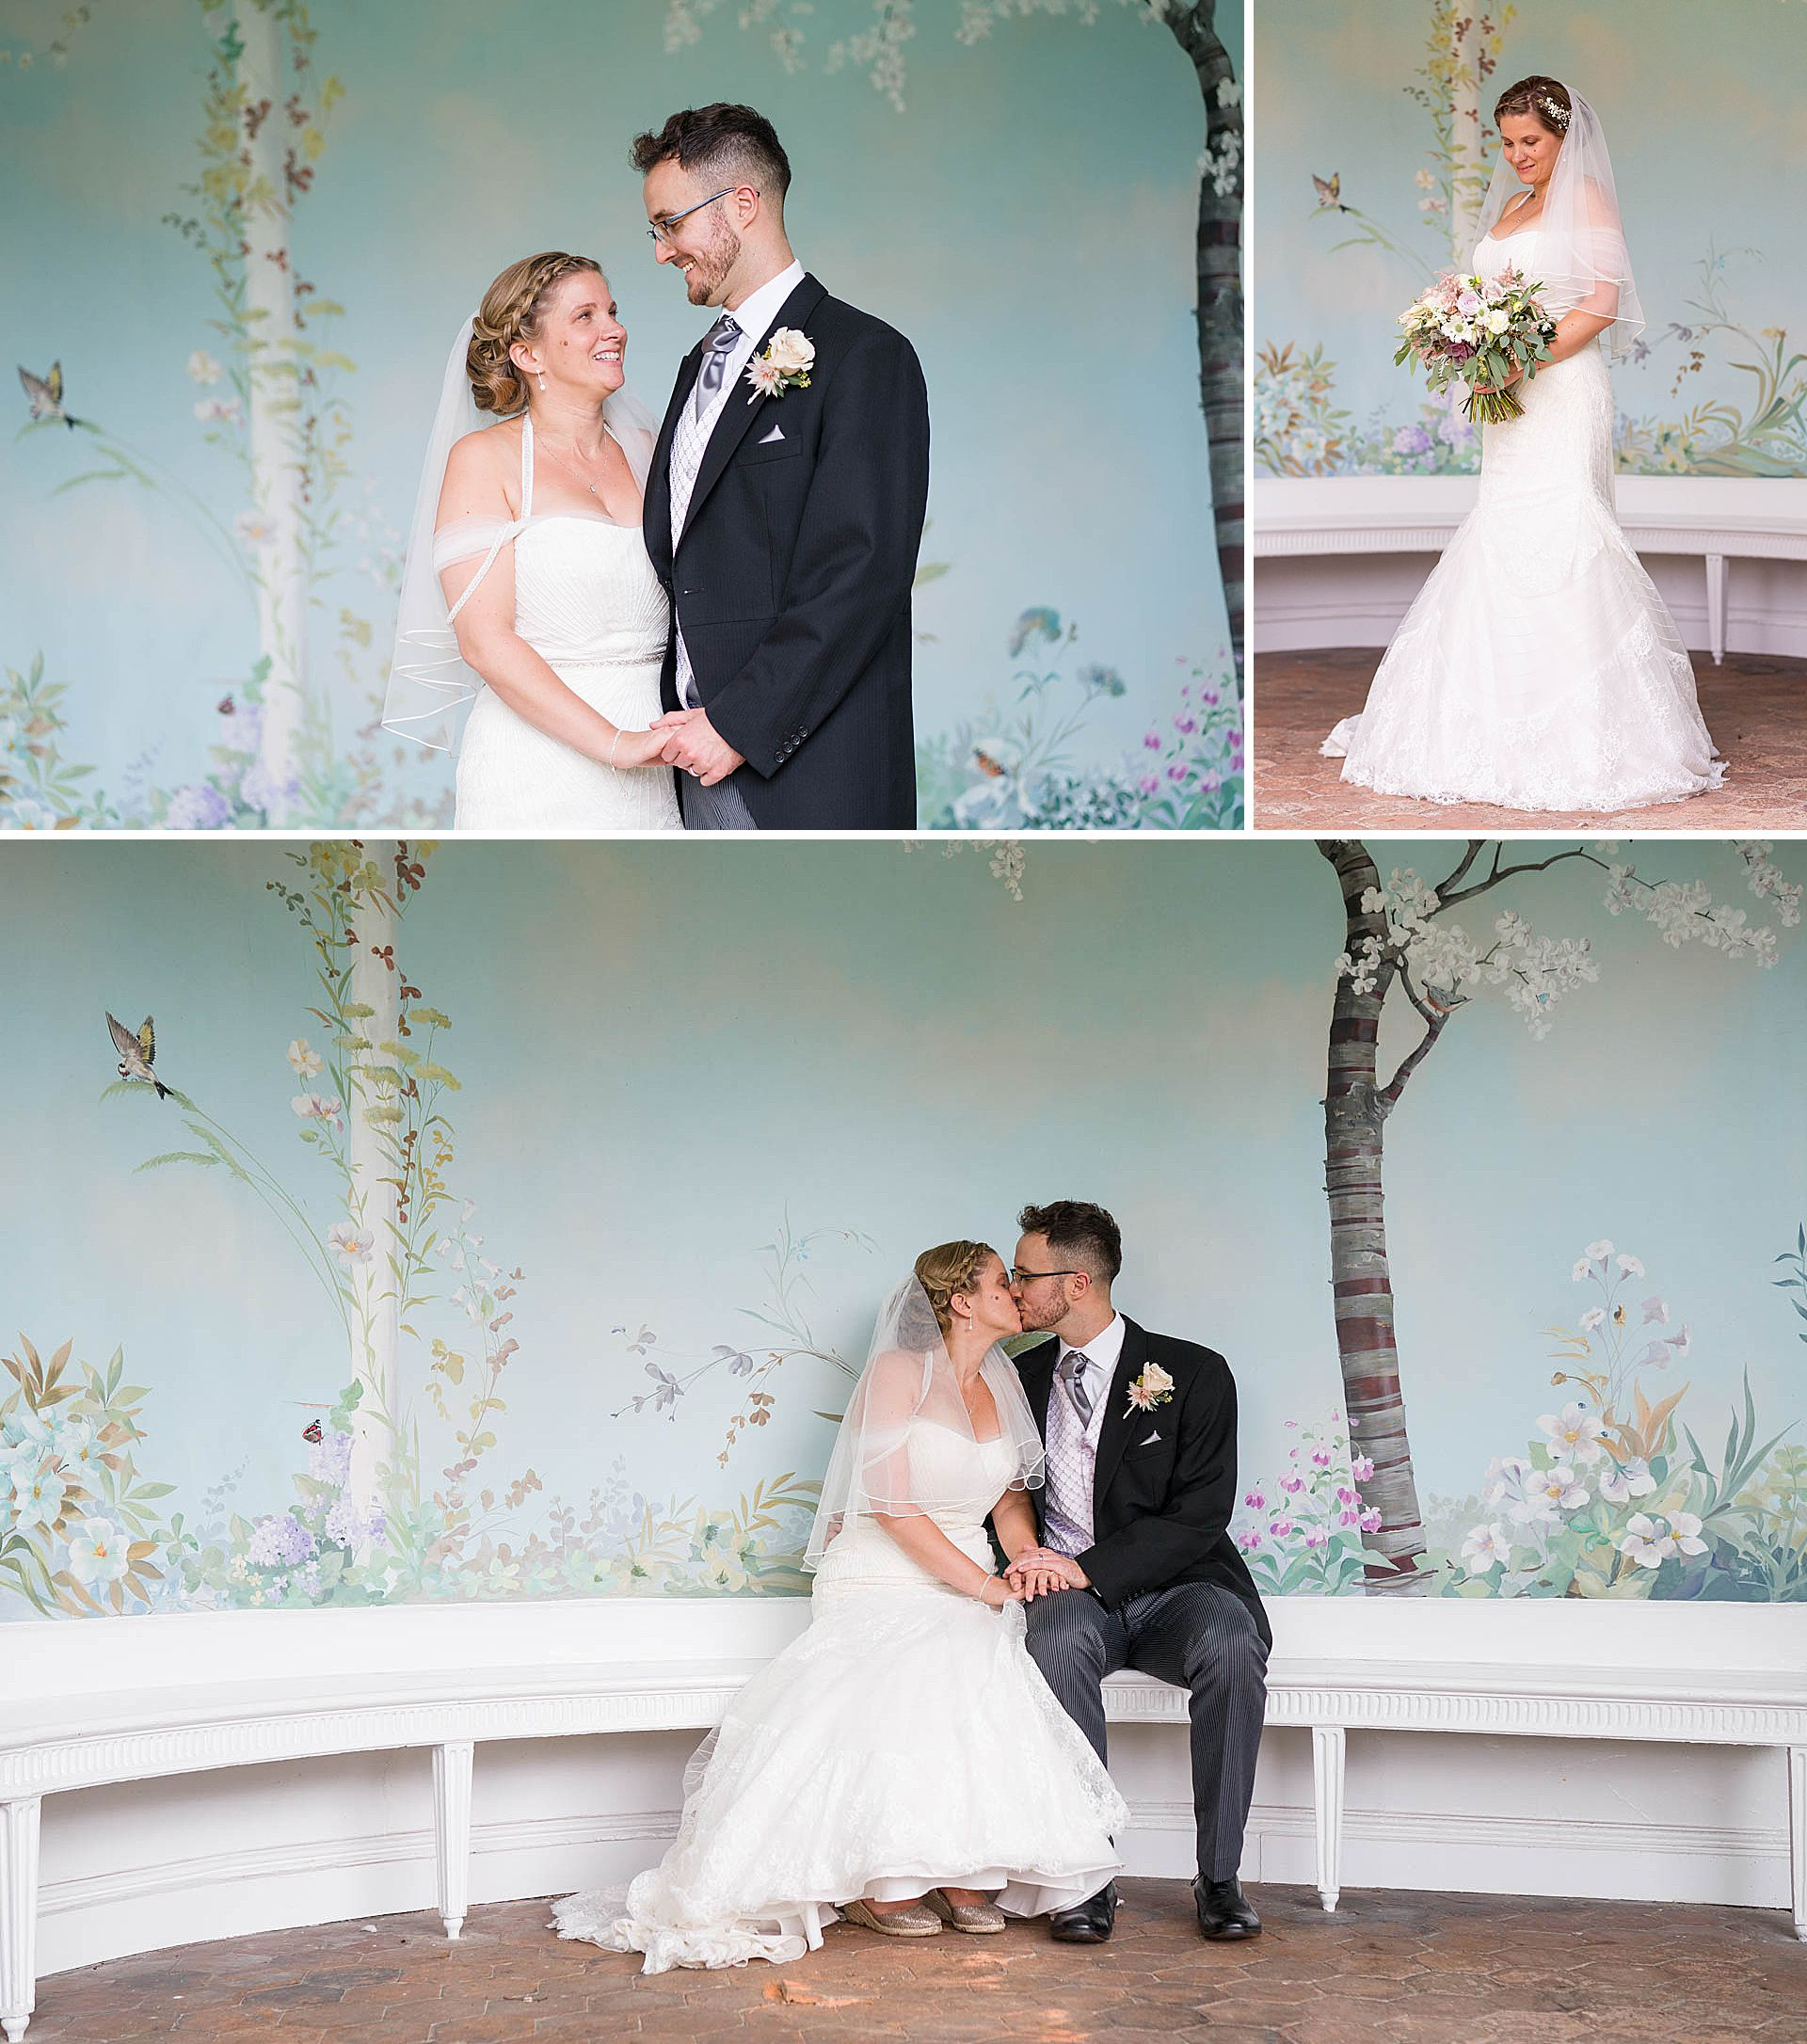 Natural and elegant wedding portriats